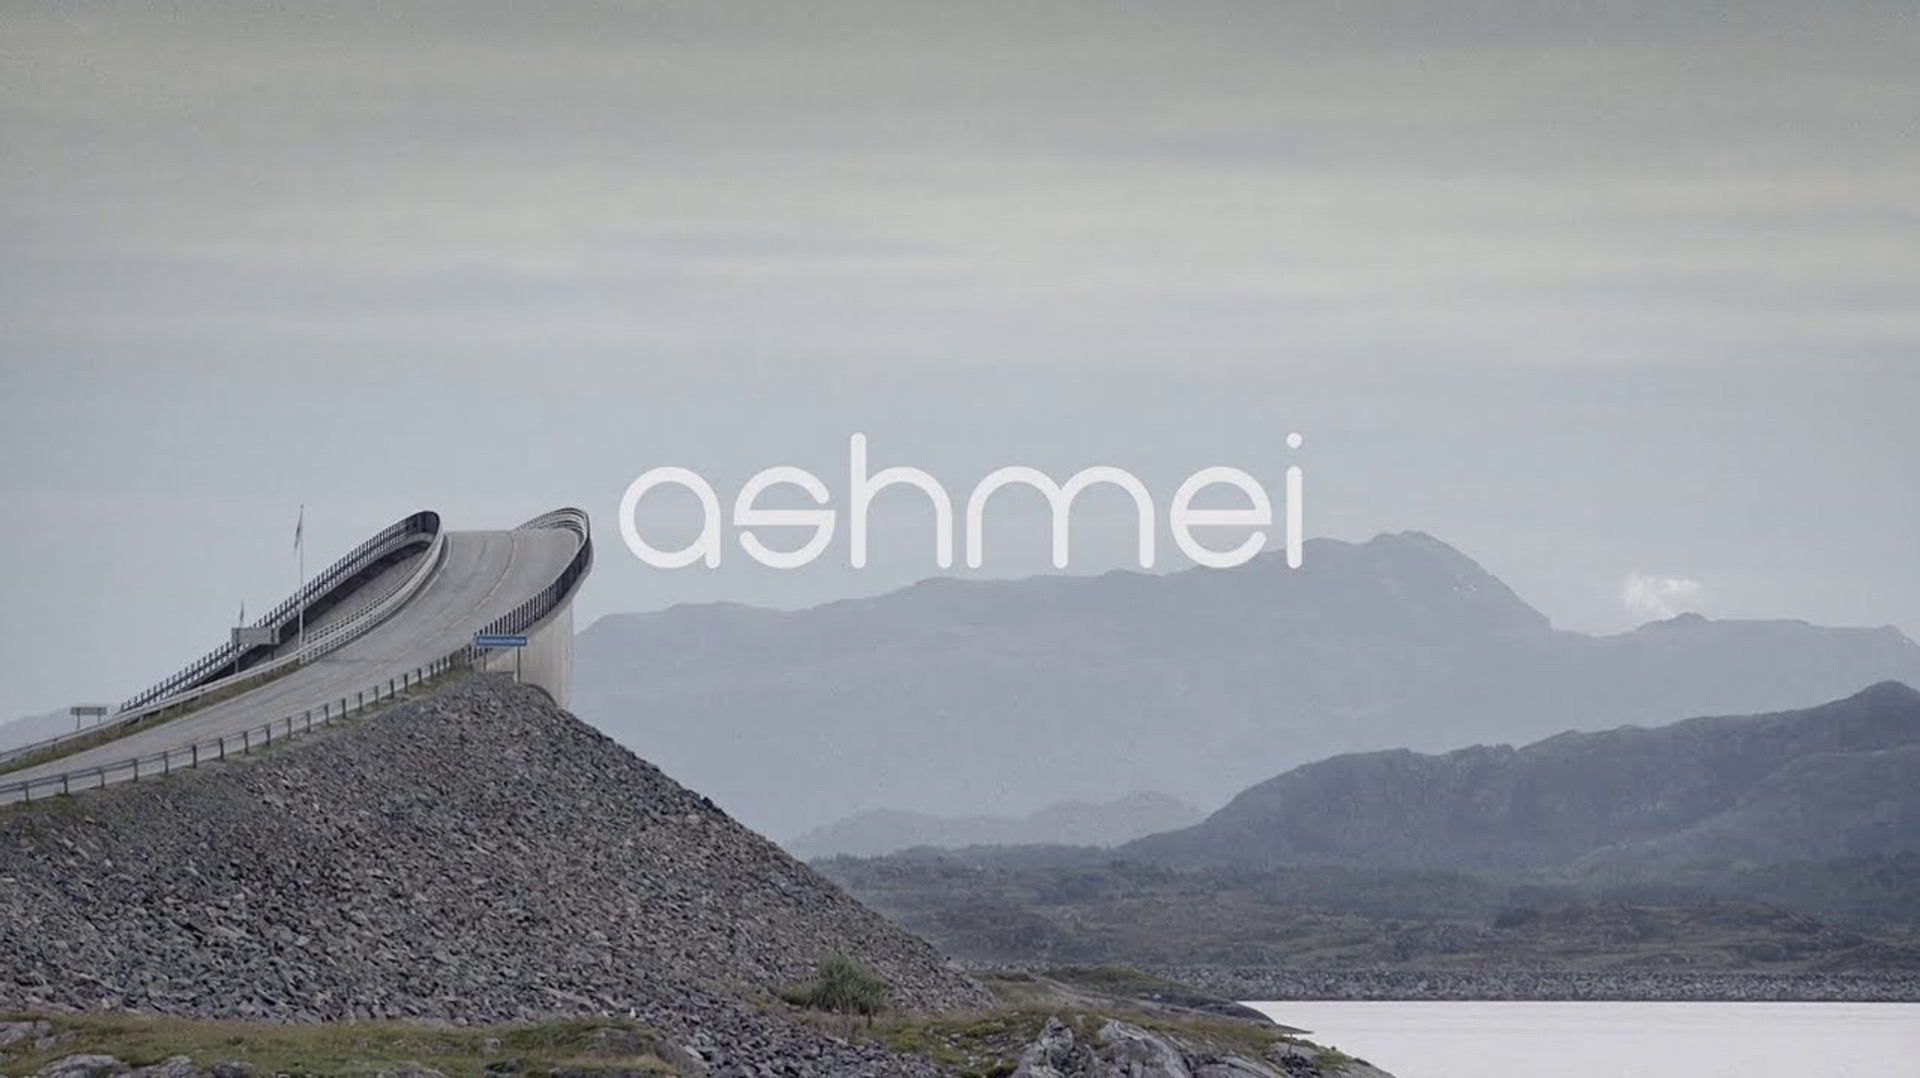 ashmei